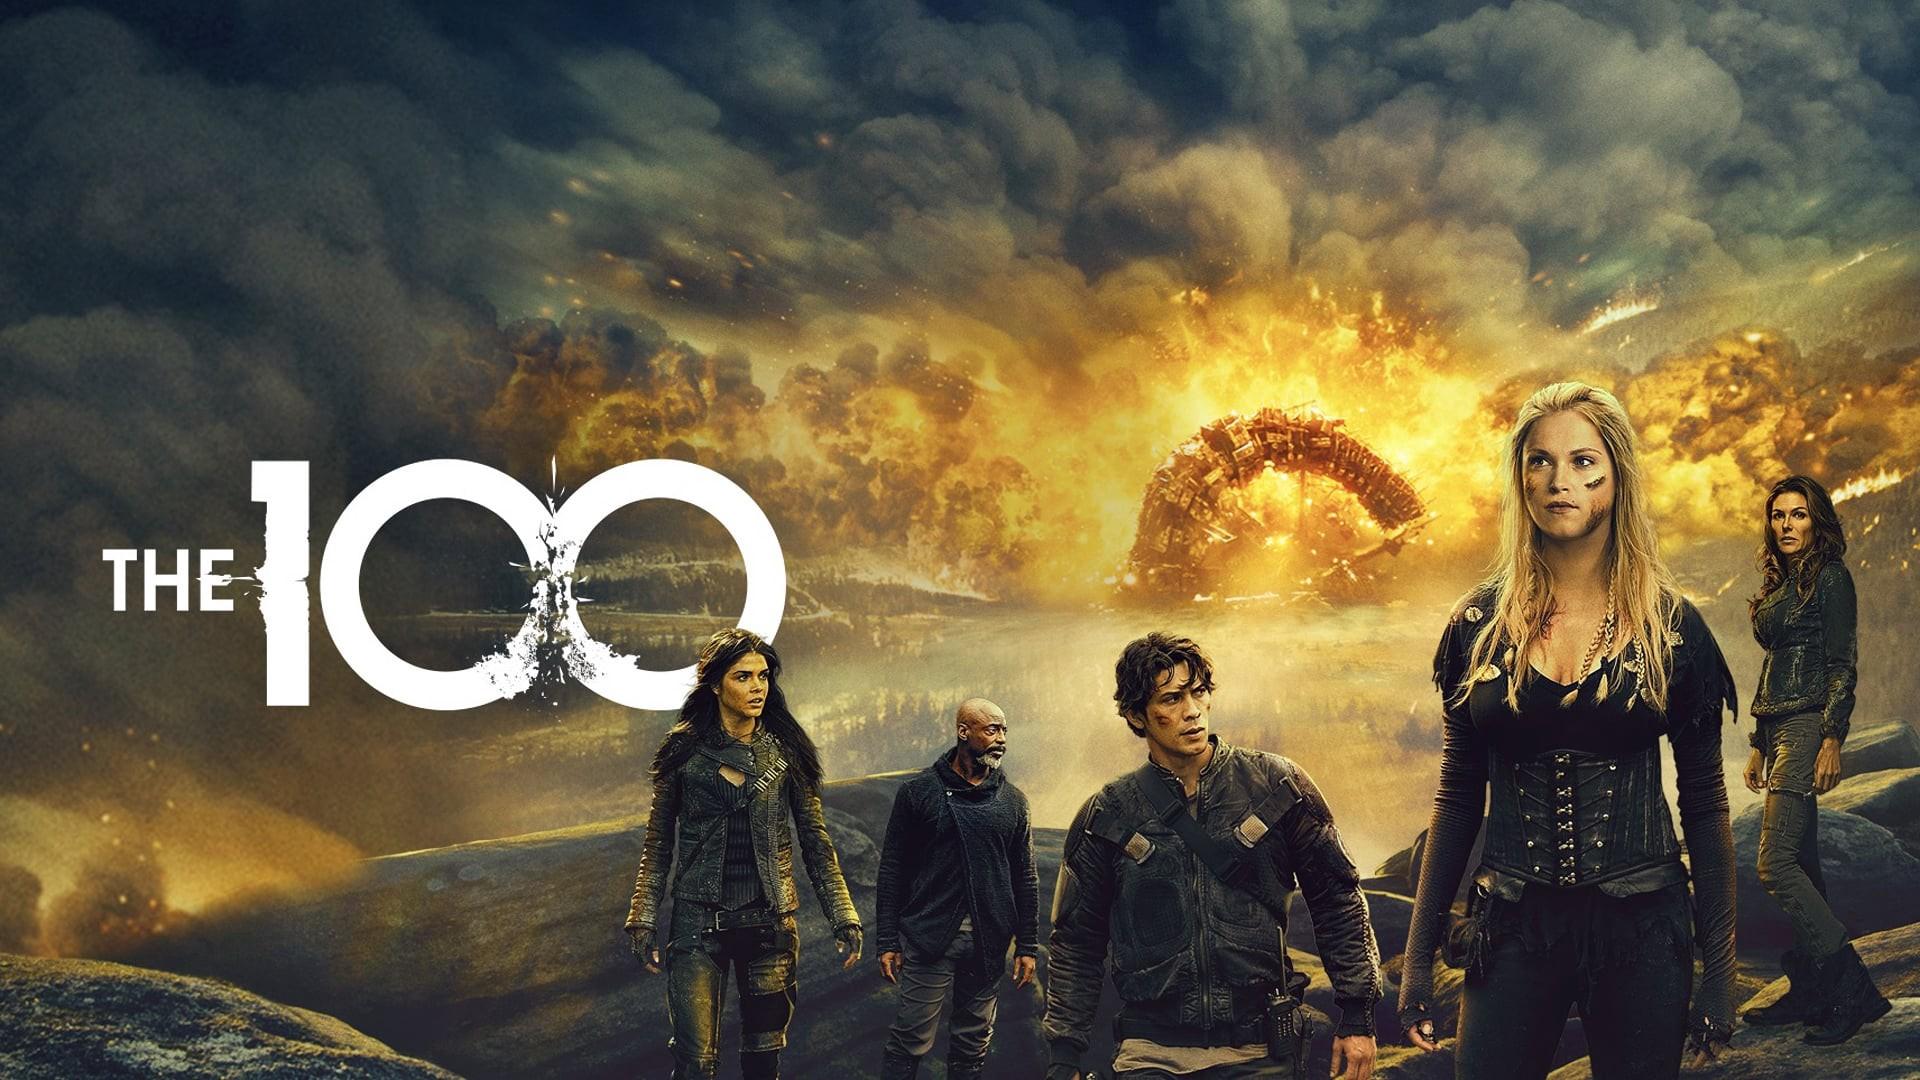 The 100 Season 7 Episode 7 Release Date